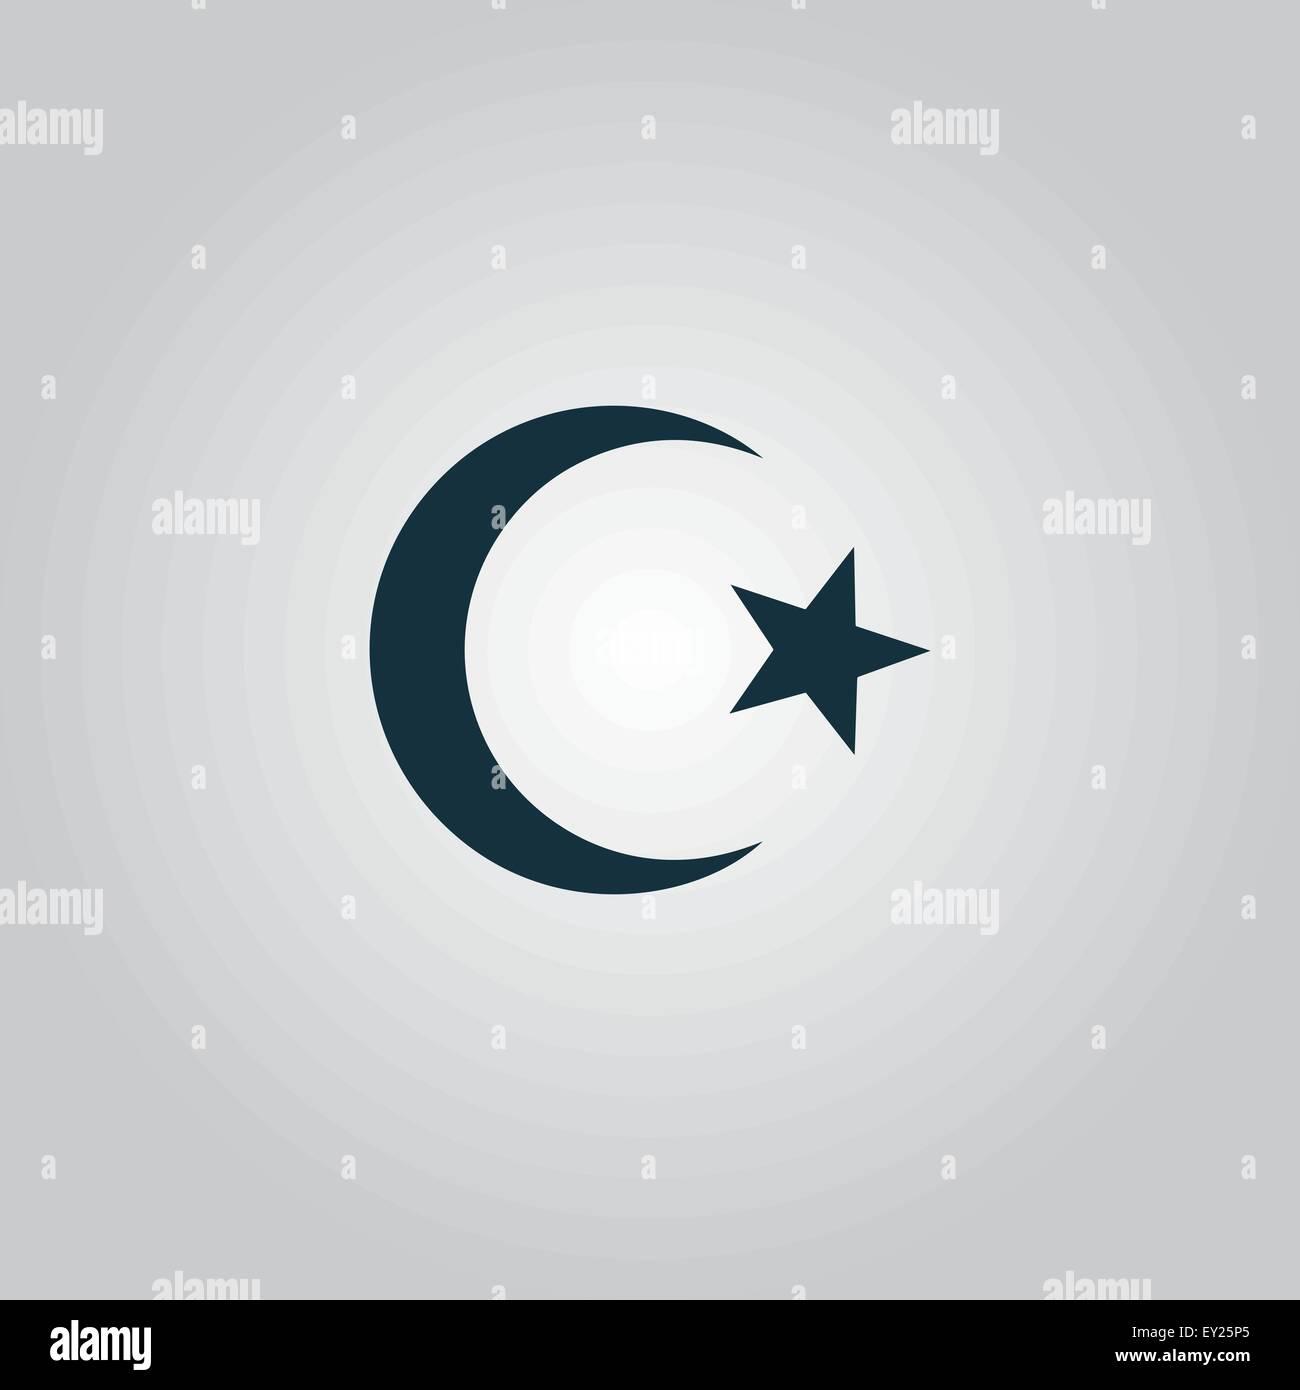 Islam Symbol Stock Vector Art Illustration Vector Image 85485629